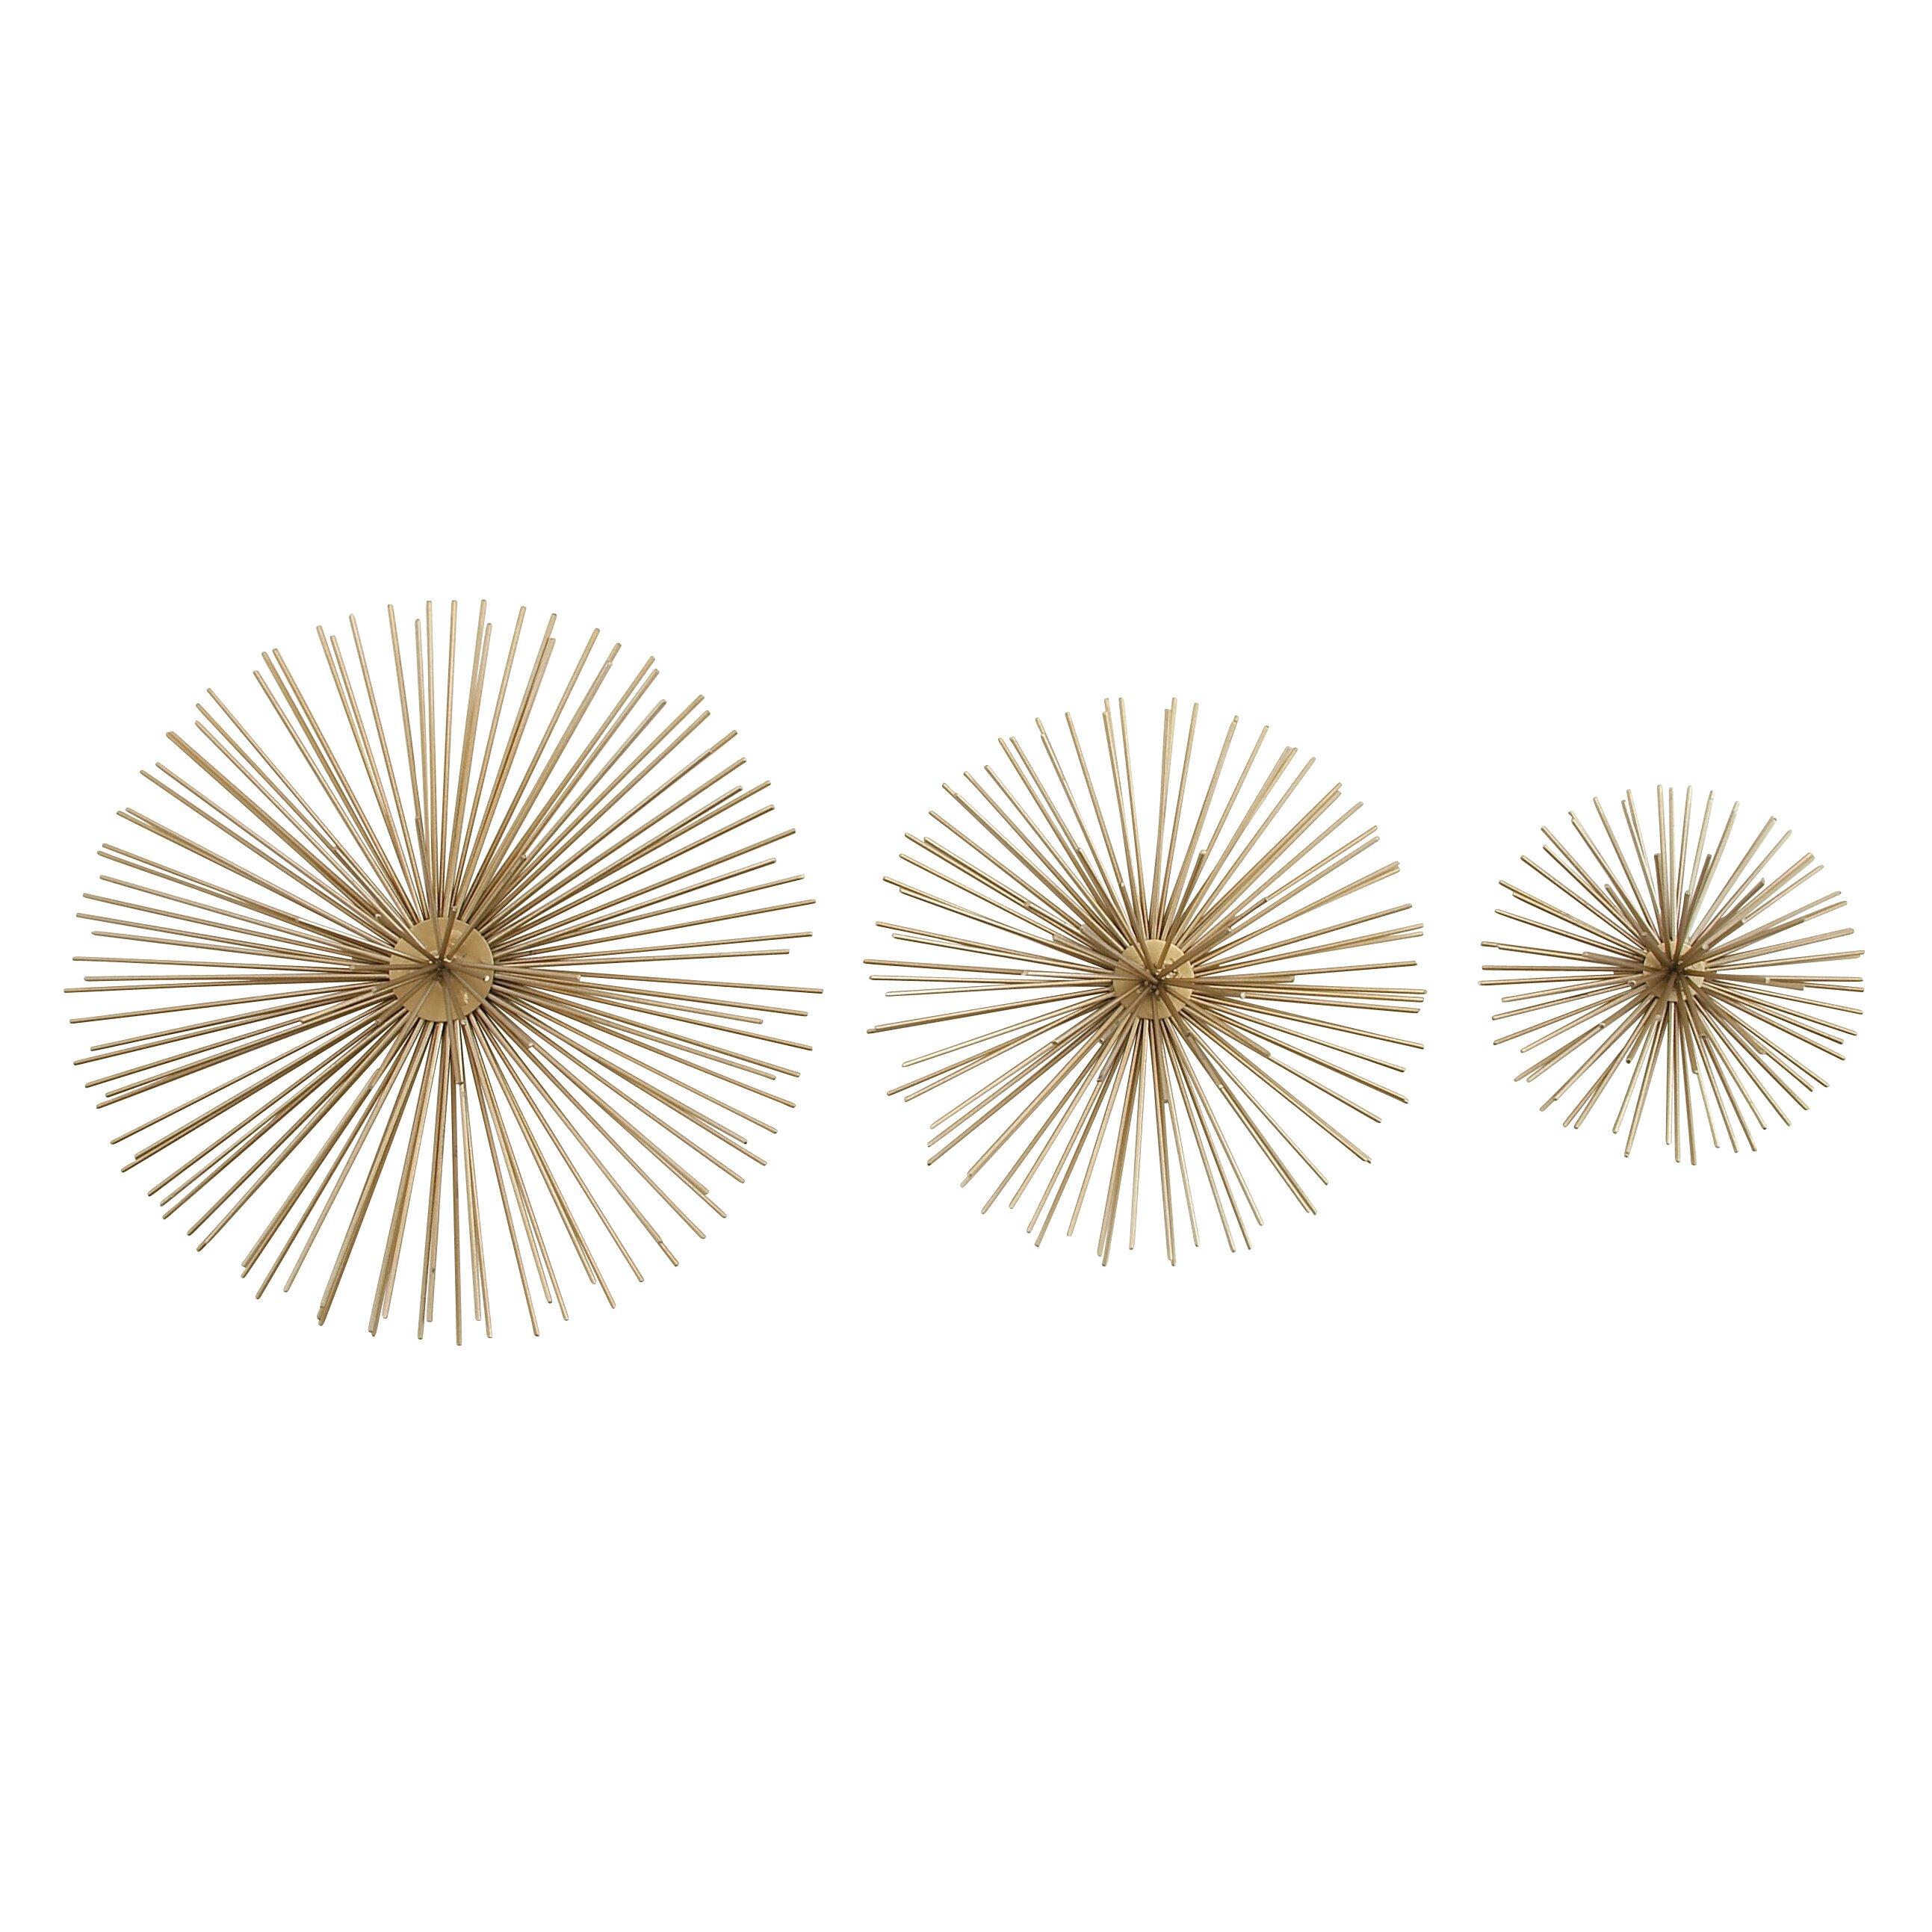 Glass Star Wall Decor : Cole grey piece star wall decor set reviews wayfair